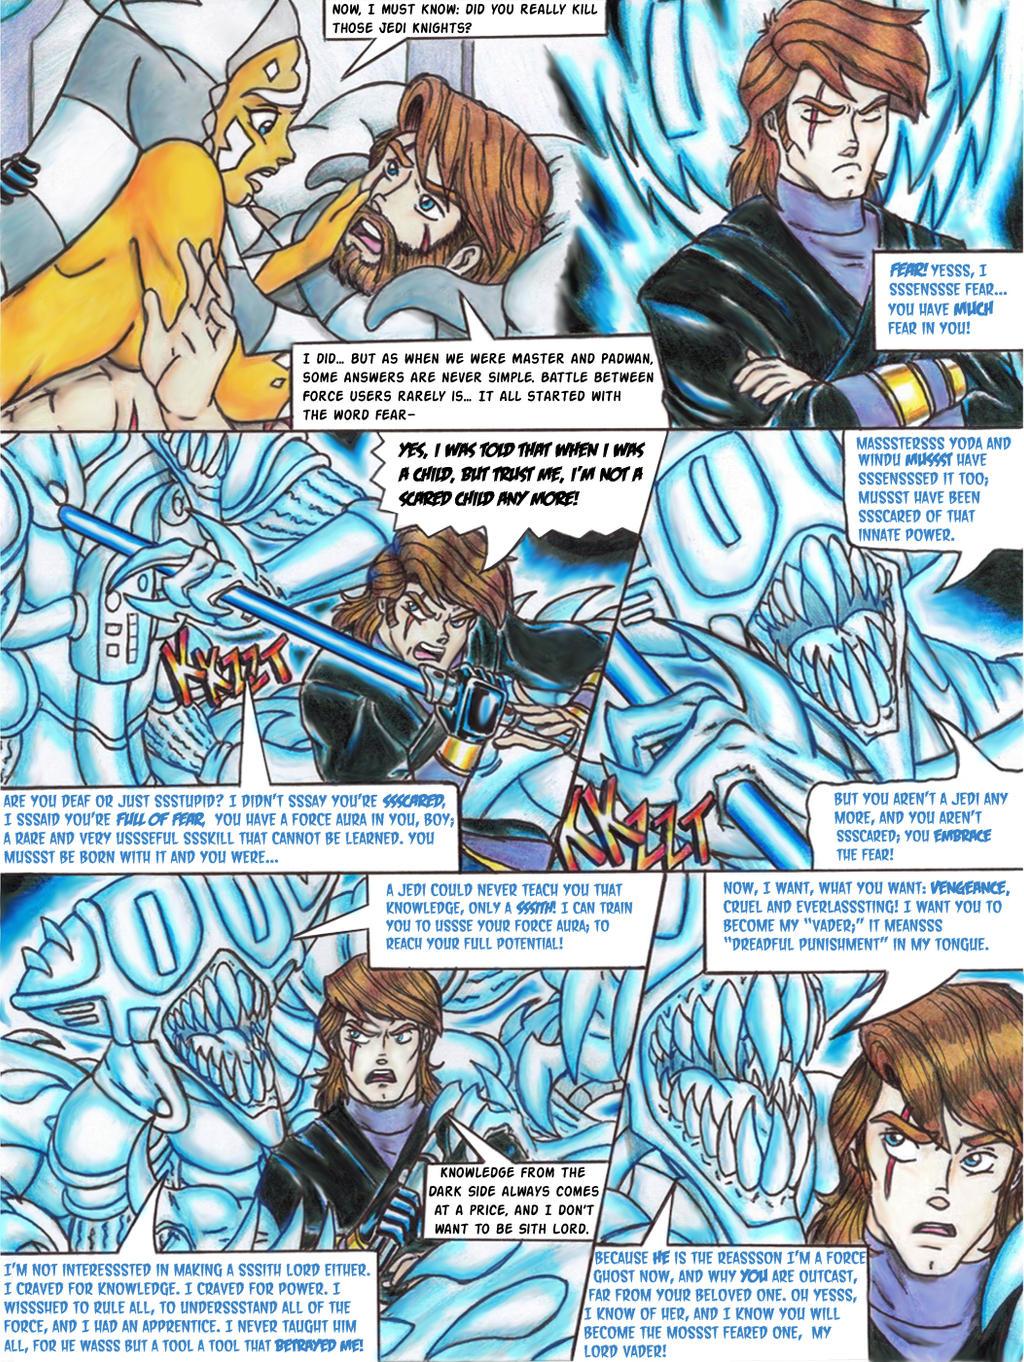 SW-CW Going Against Destiny 18 by YogurthFrost on DeviantArt